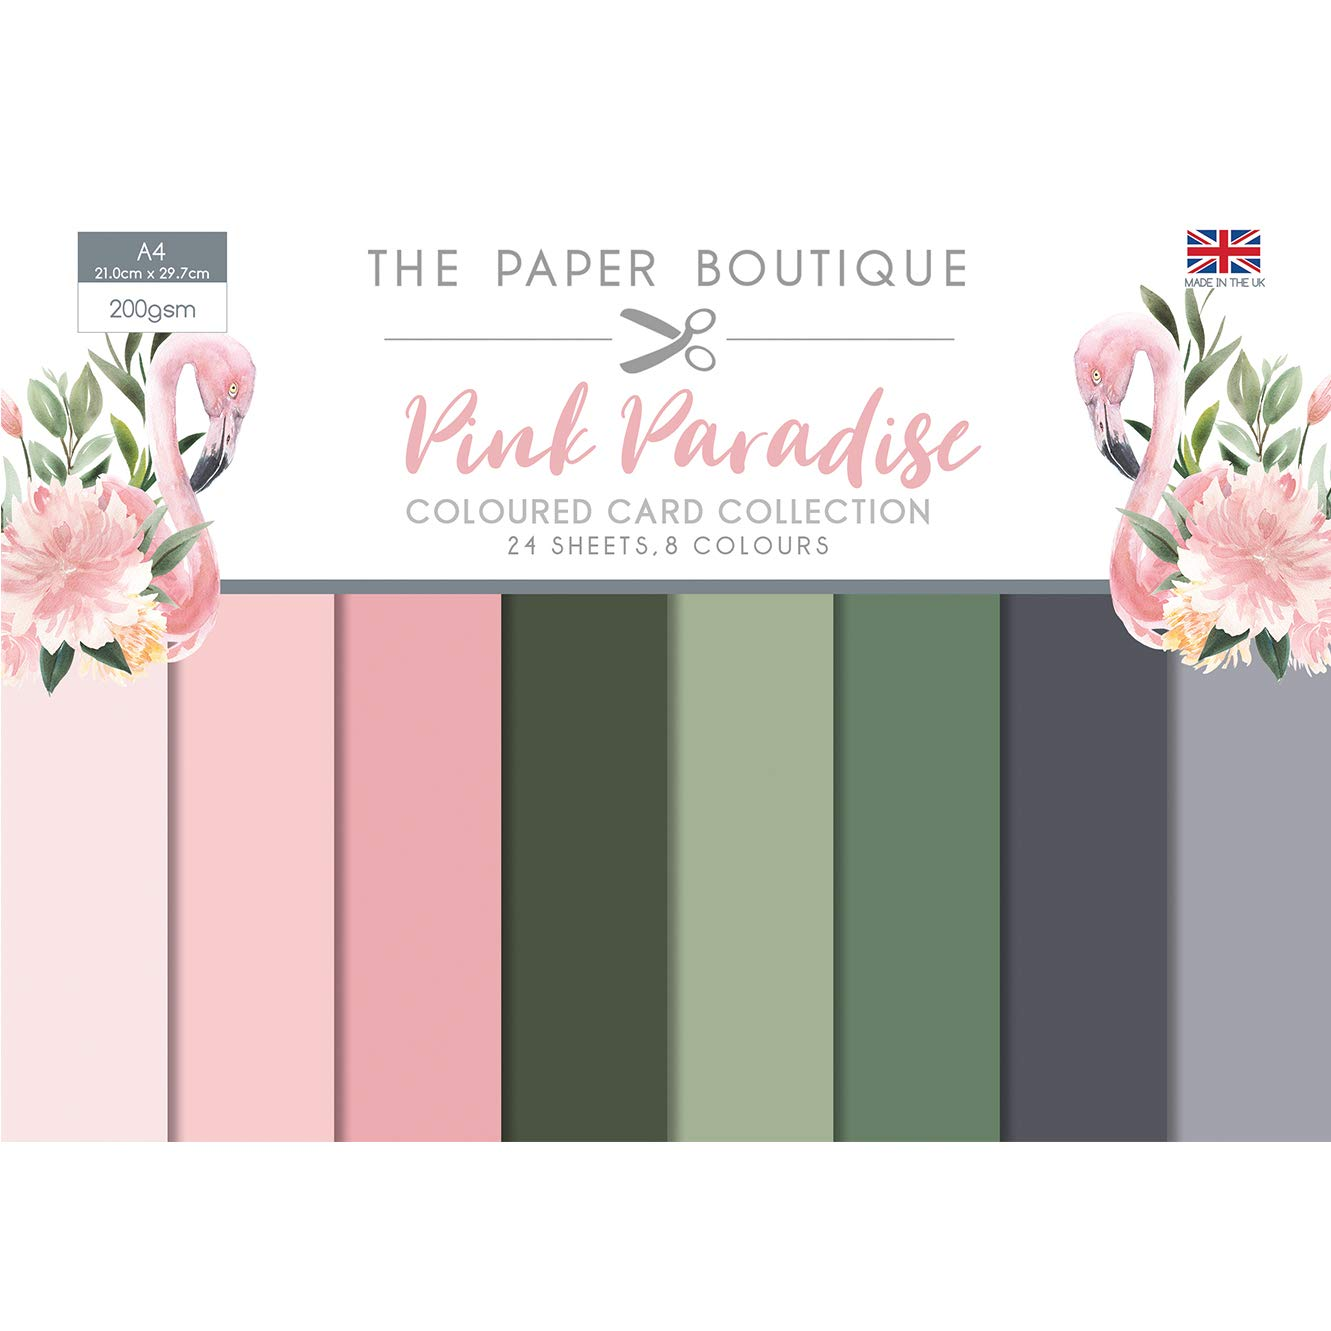 The Paper Boutique Pink Paradise Colour Card Collection